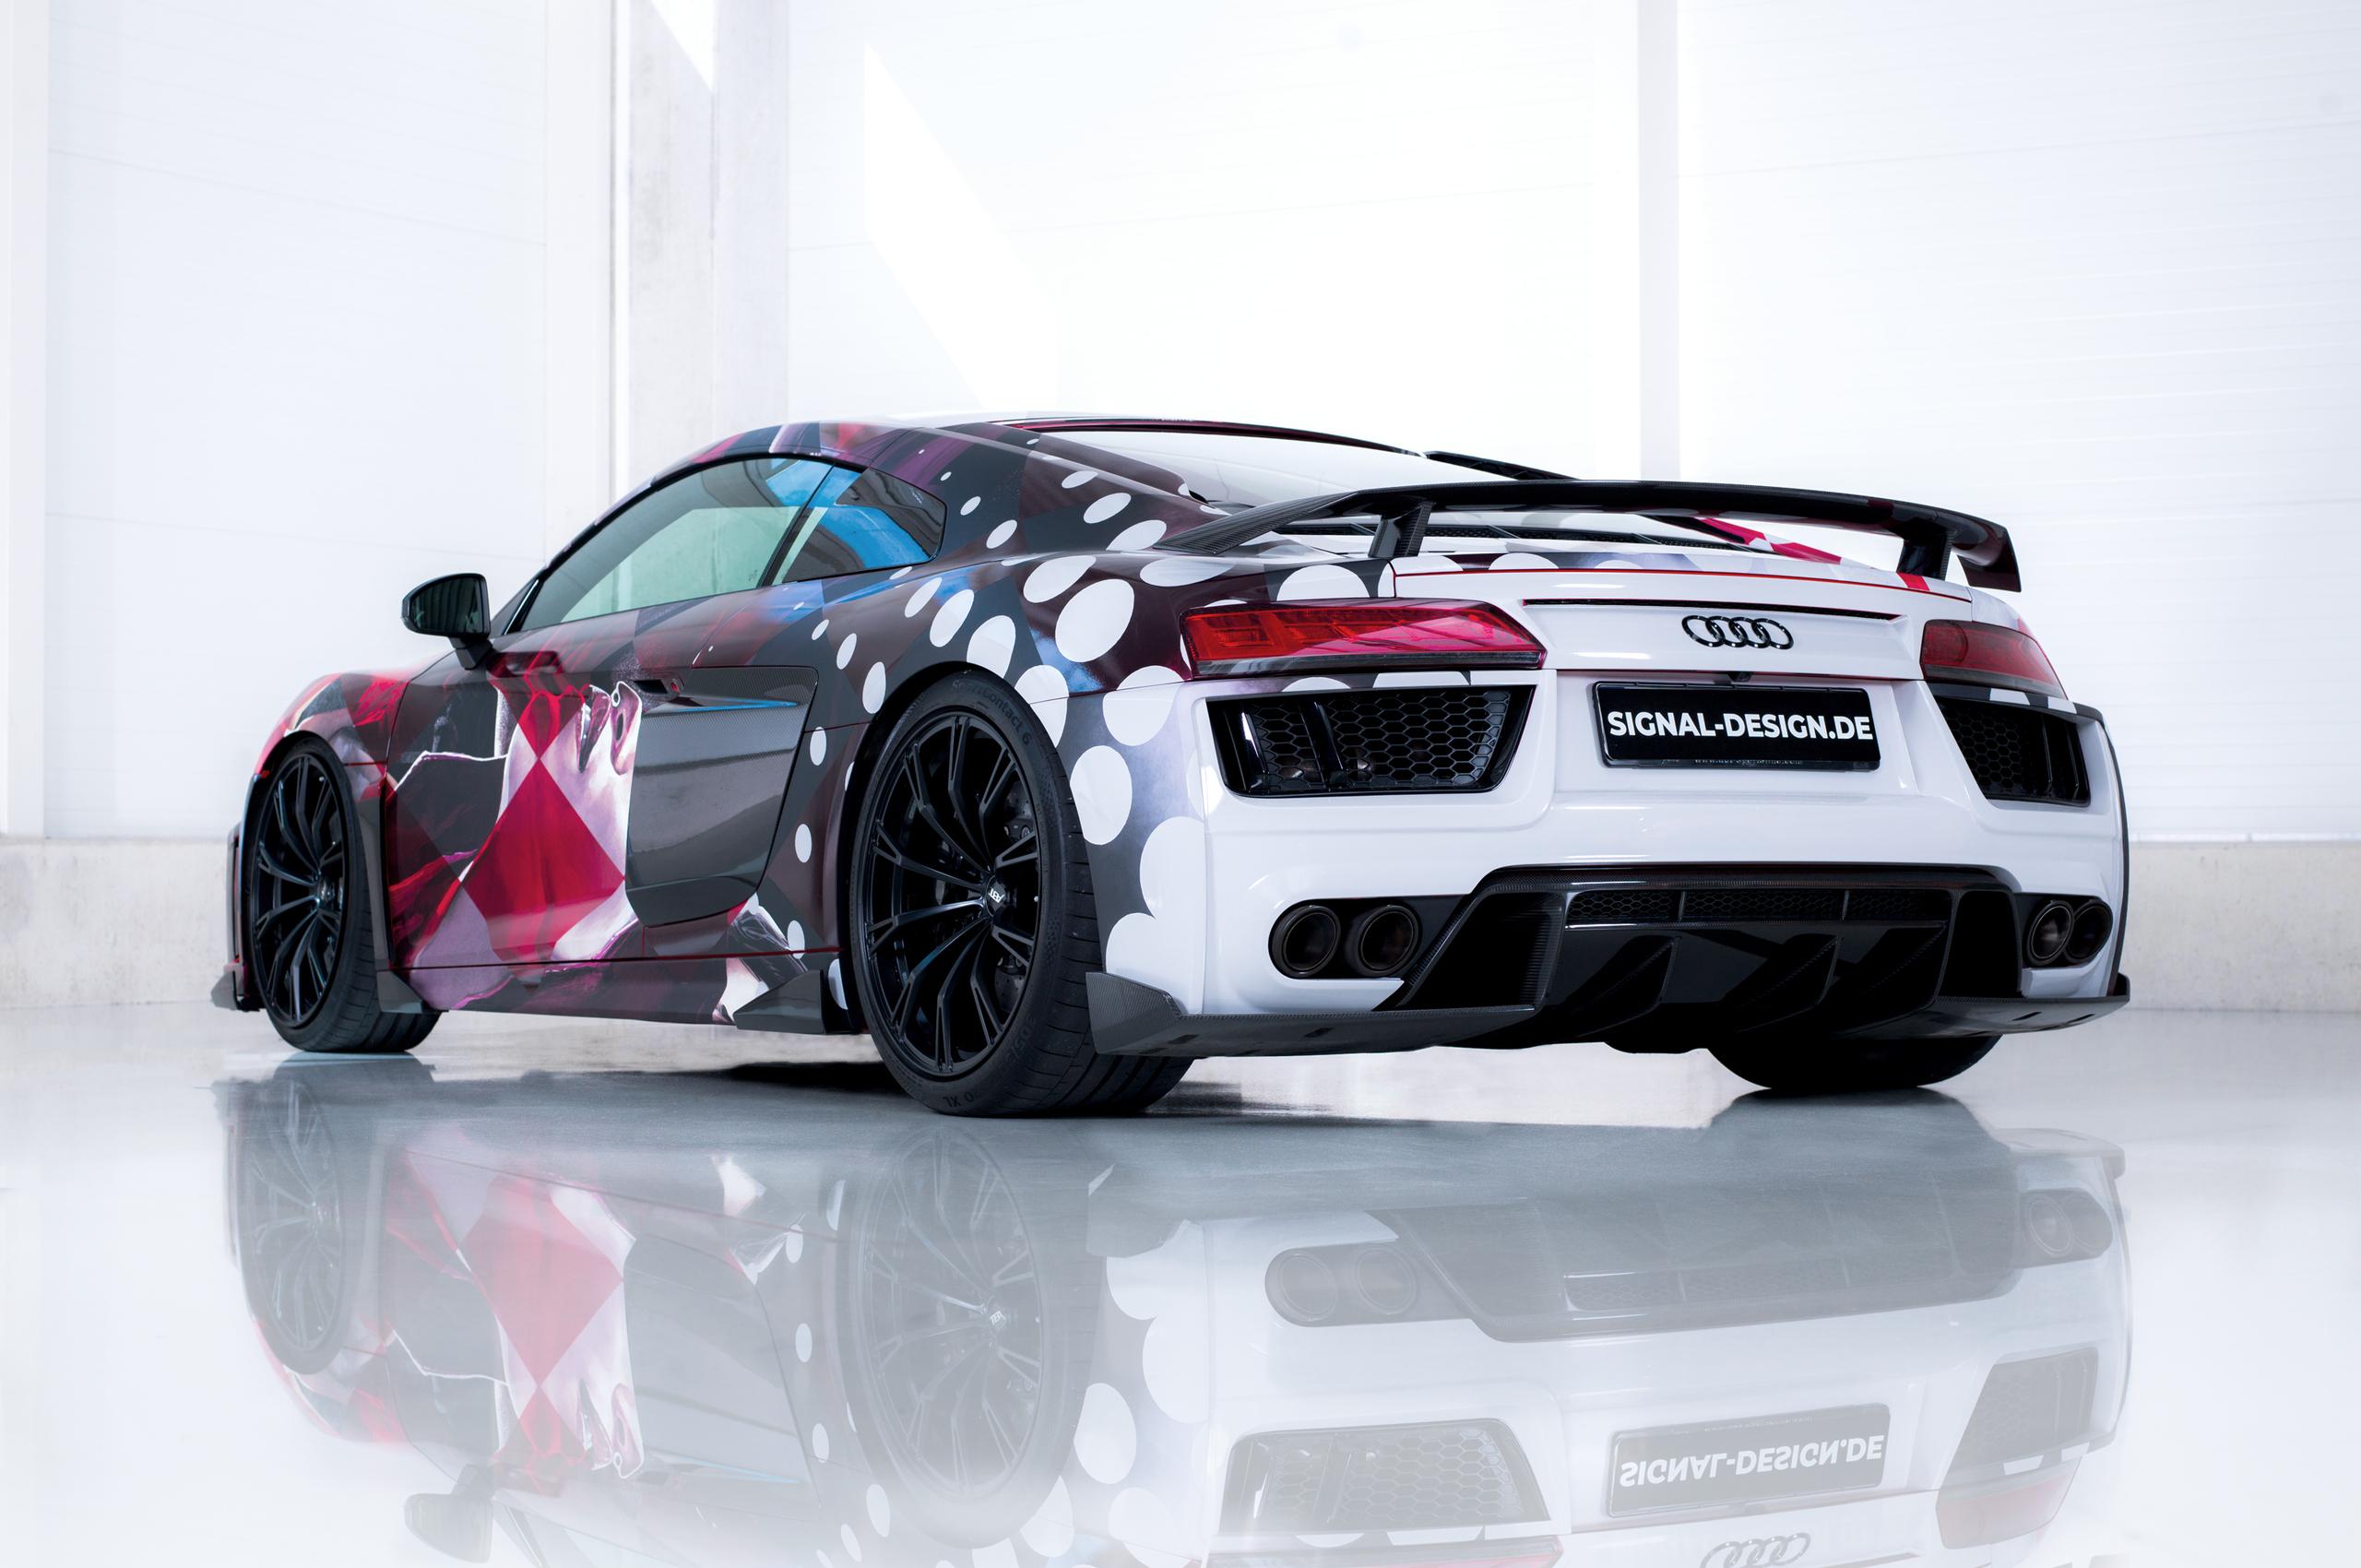 2560x1700 2018 Abt Audi R8 Art Color Chromebook Pixel Hd 4k